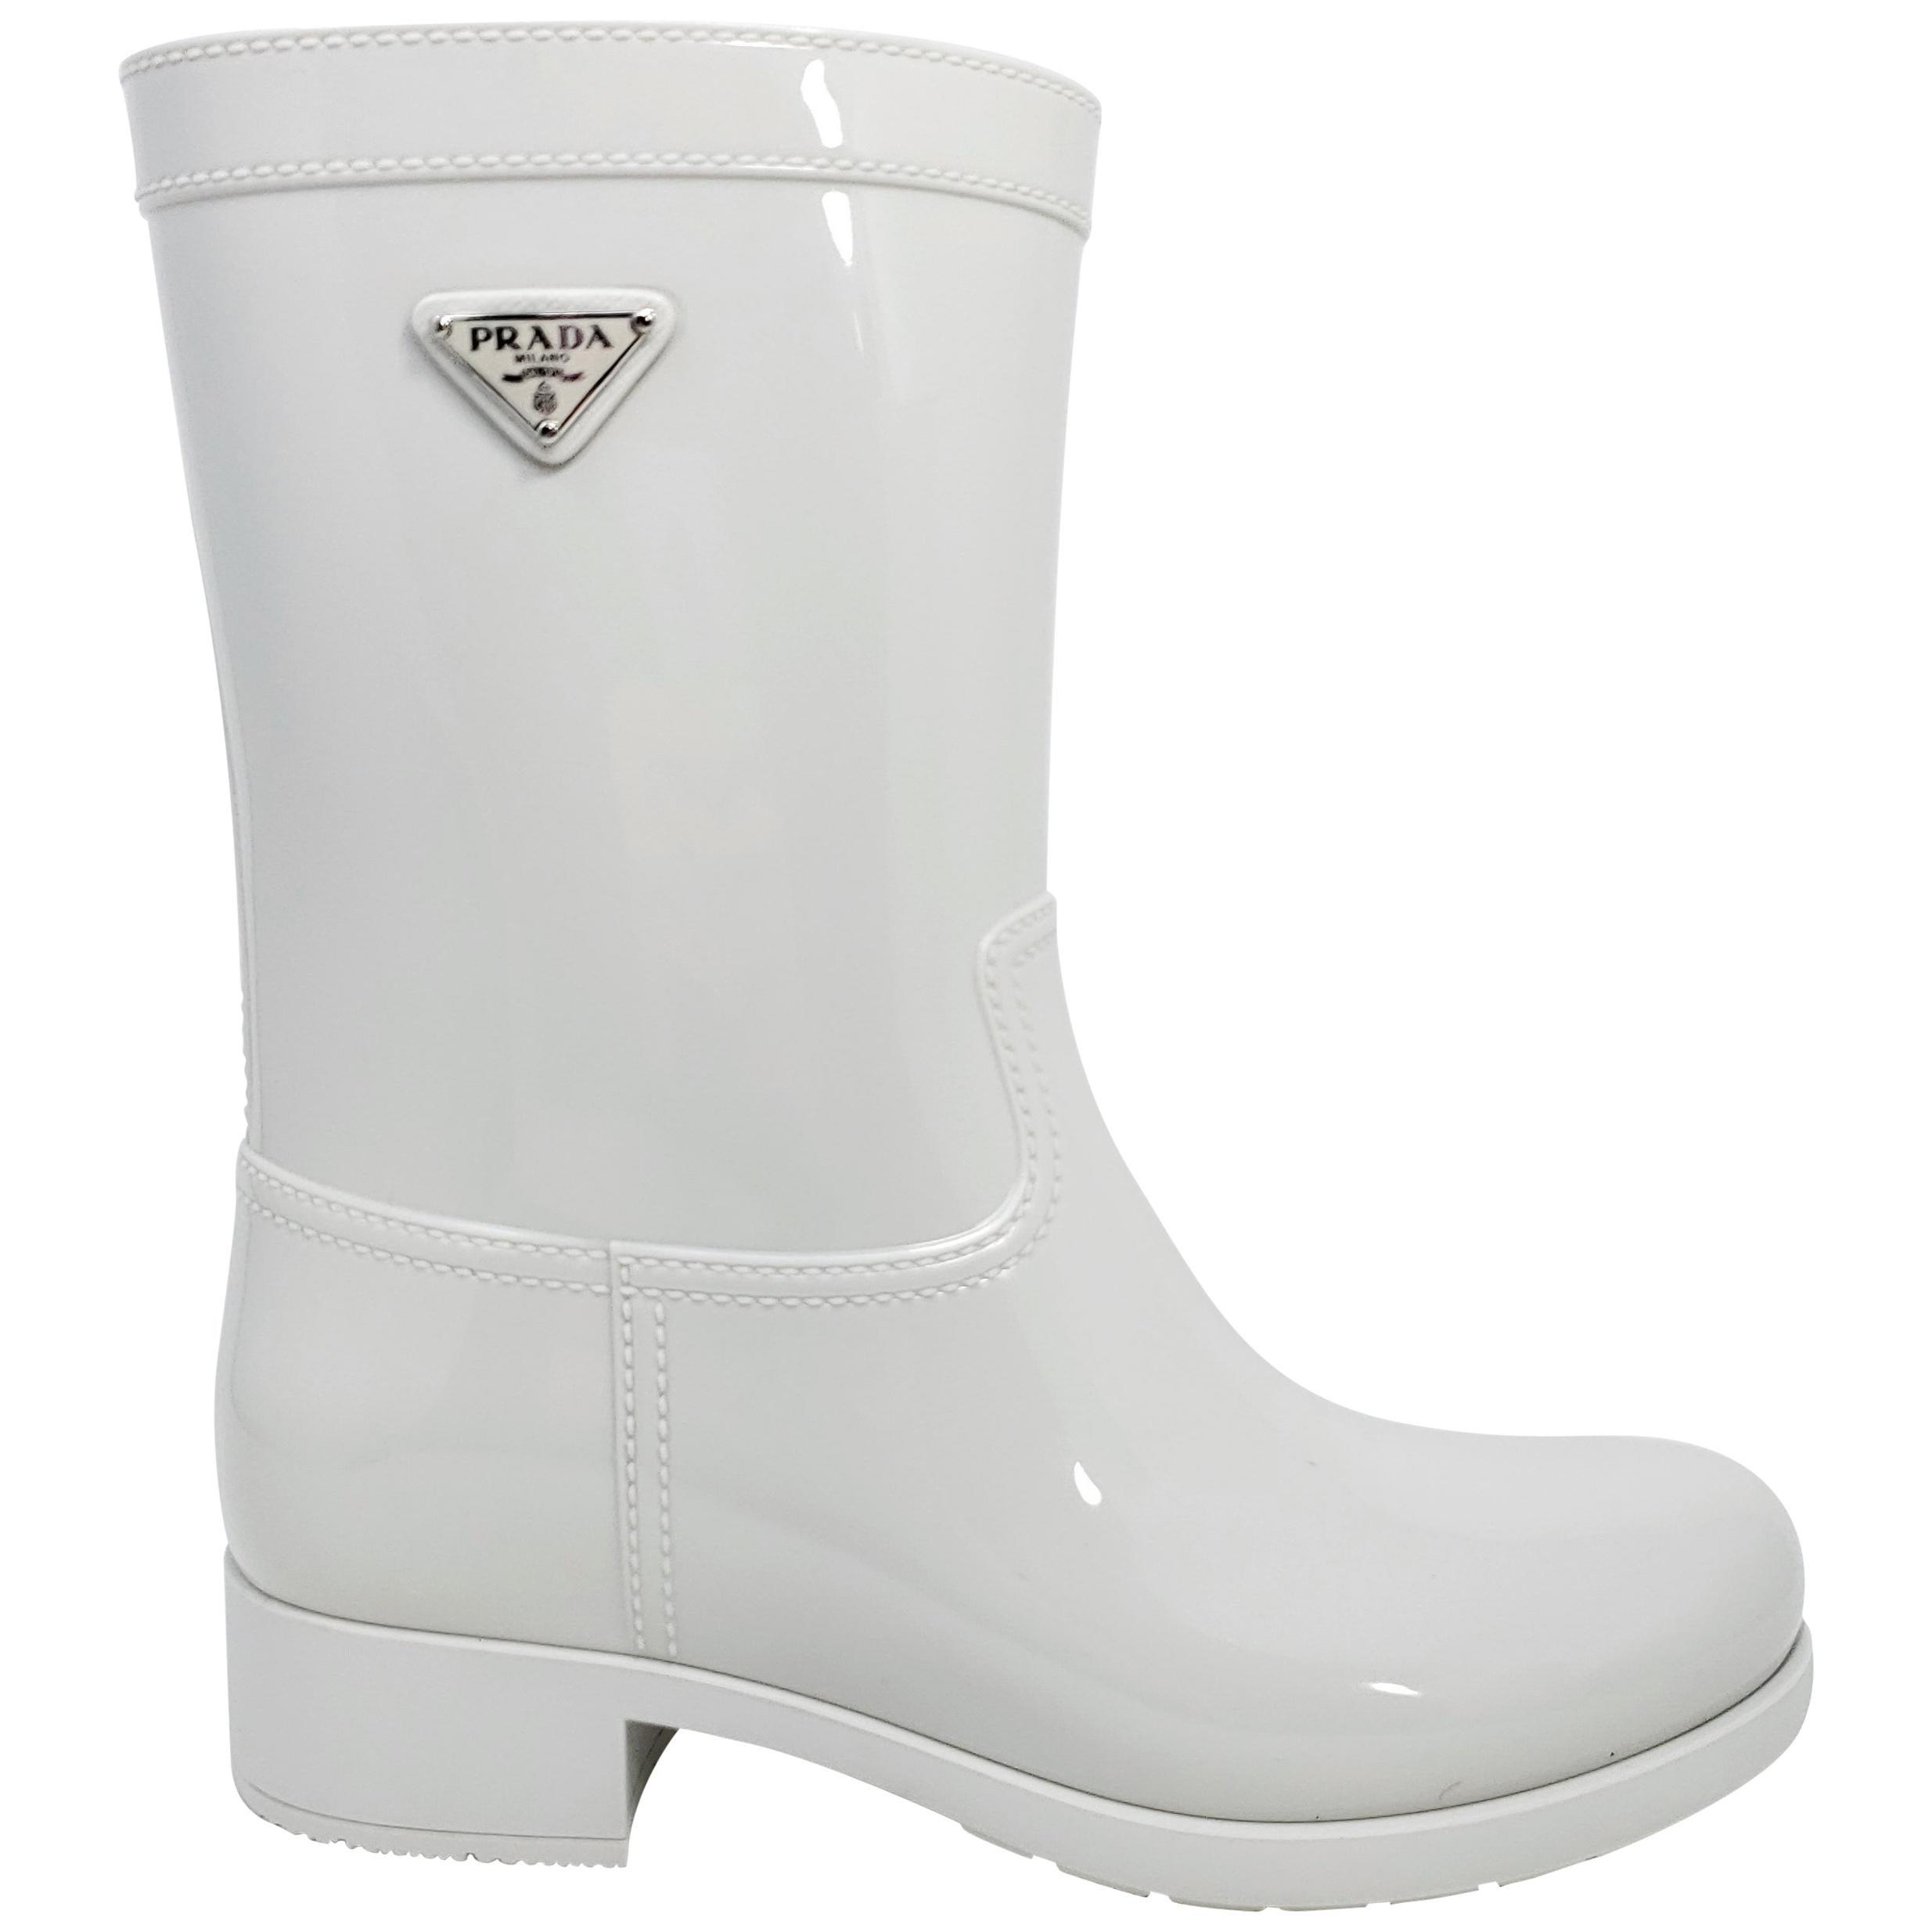 Prada Women's Sport Rubber Talco White Rain Boots Size US 8, EU 38